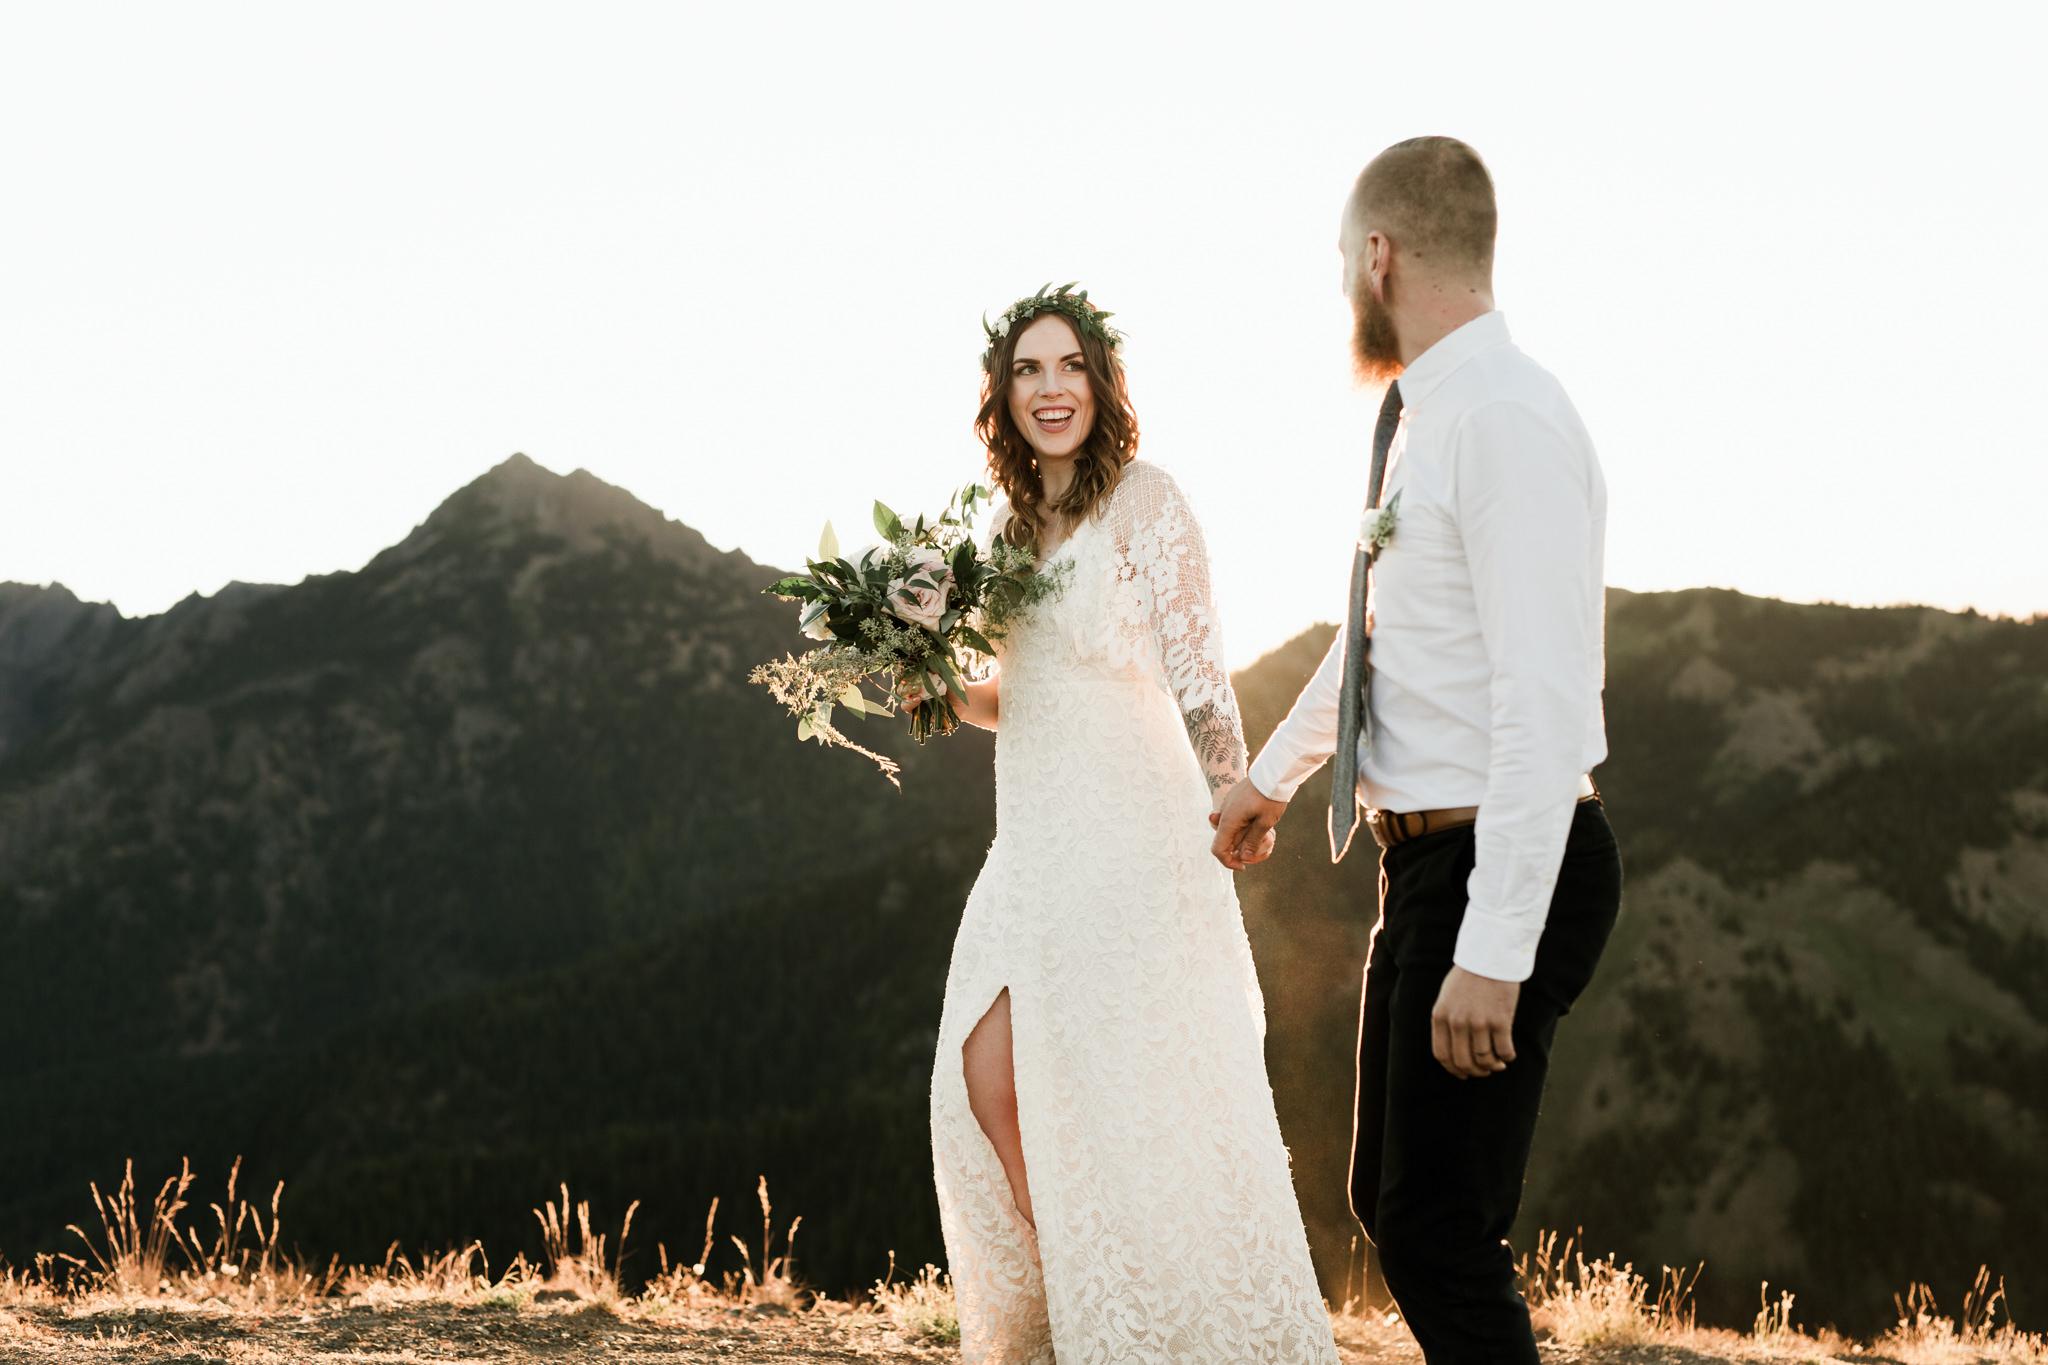 Jesse-Kasie-Hurricane-Ridge-Wedding-39.jpg